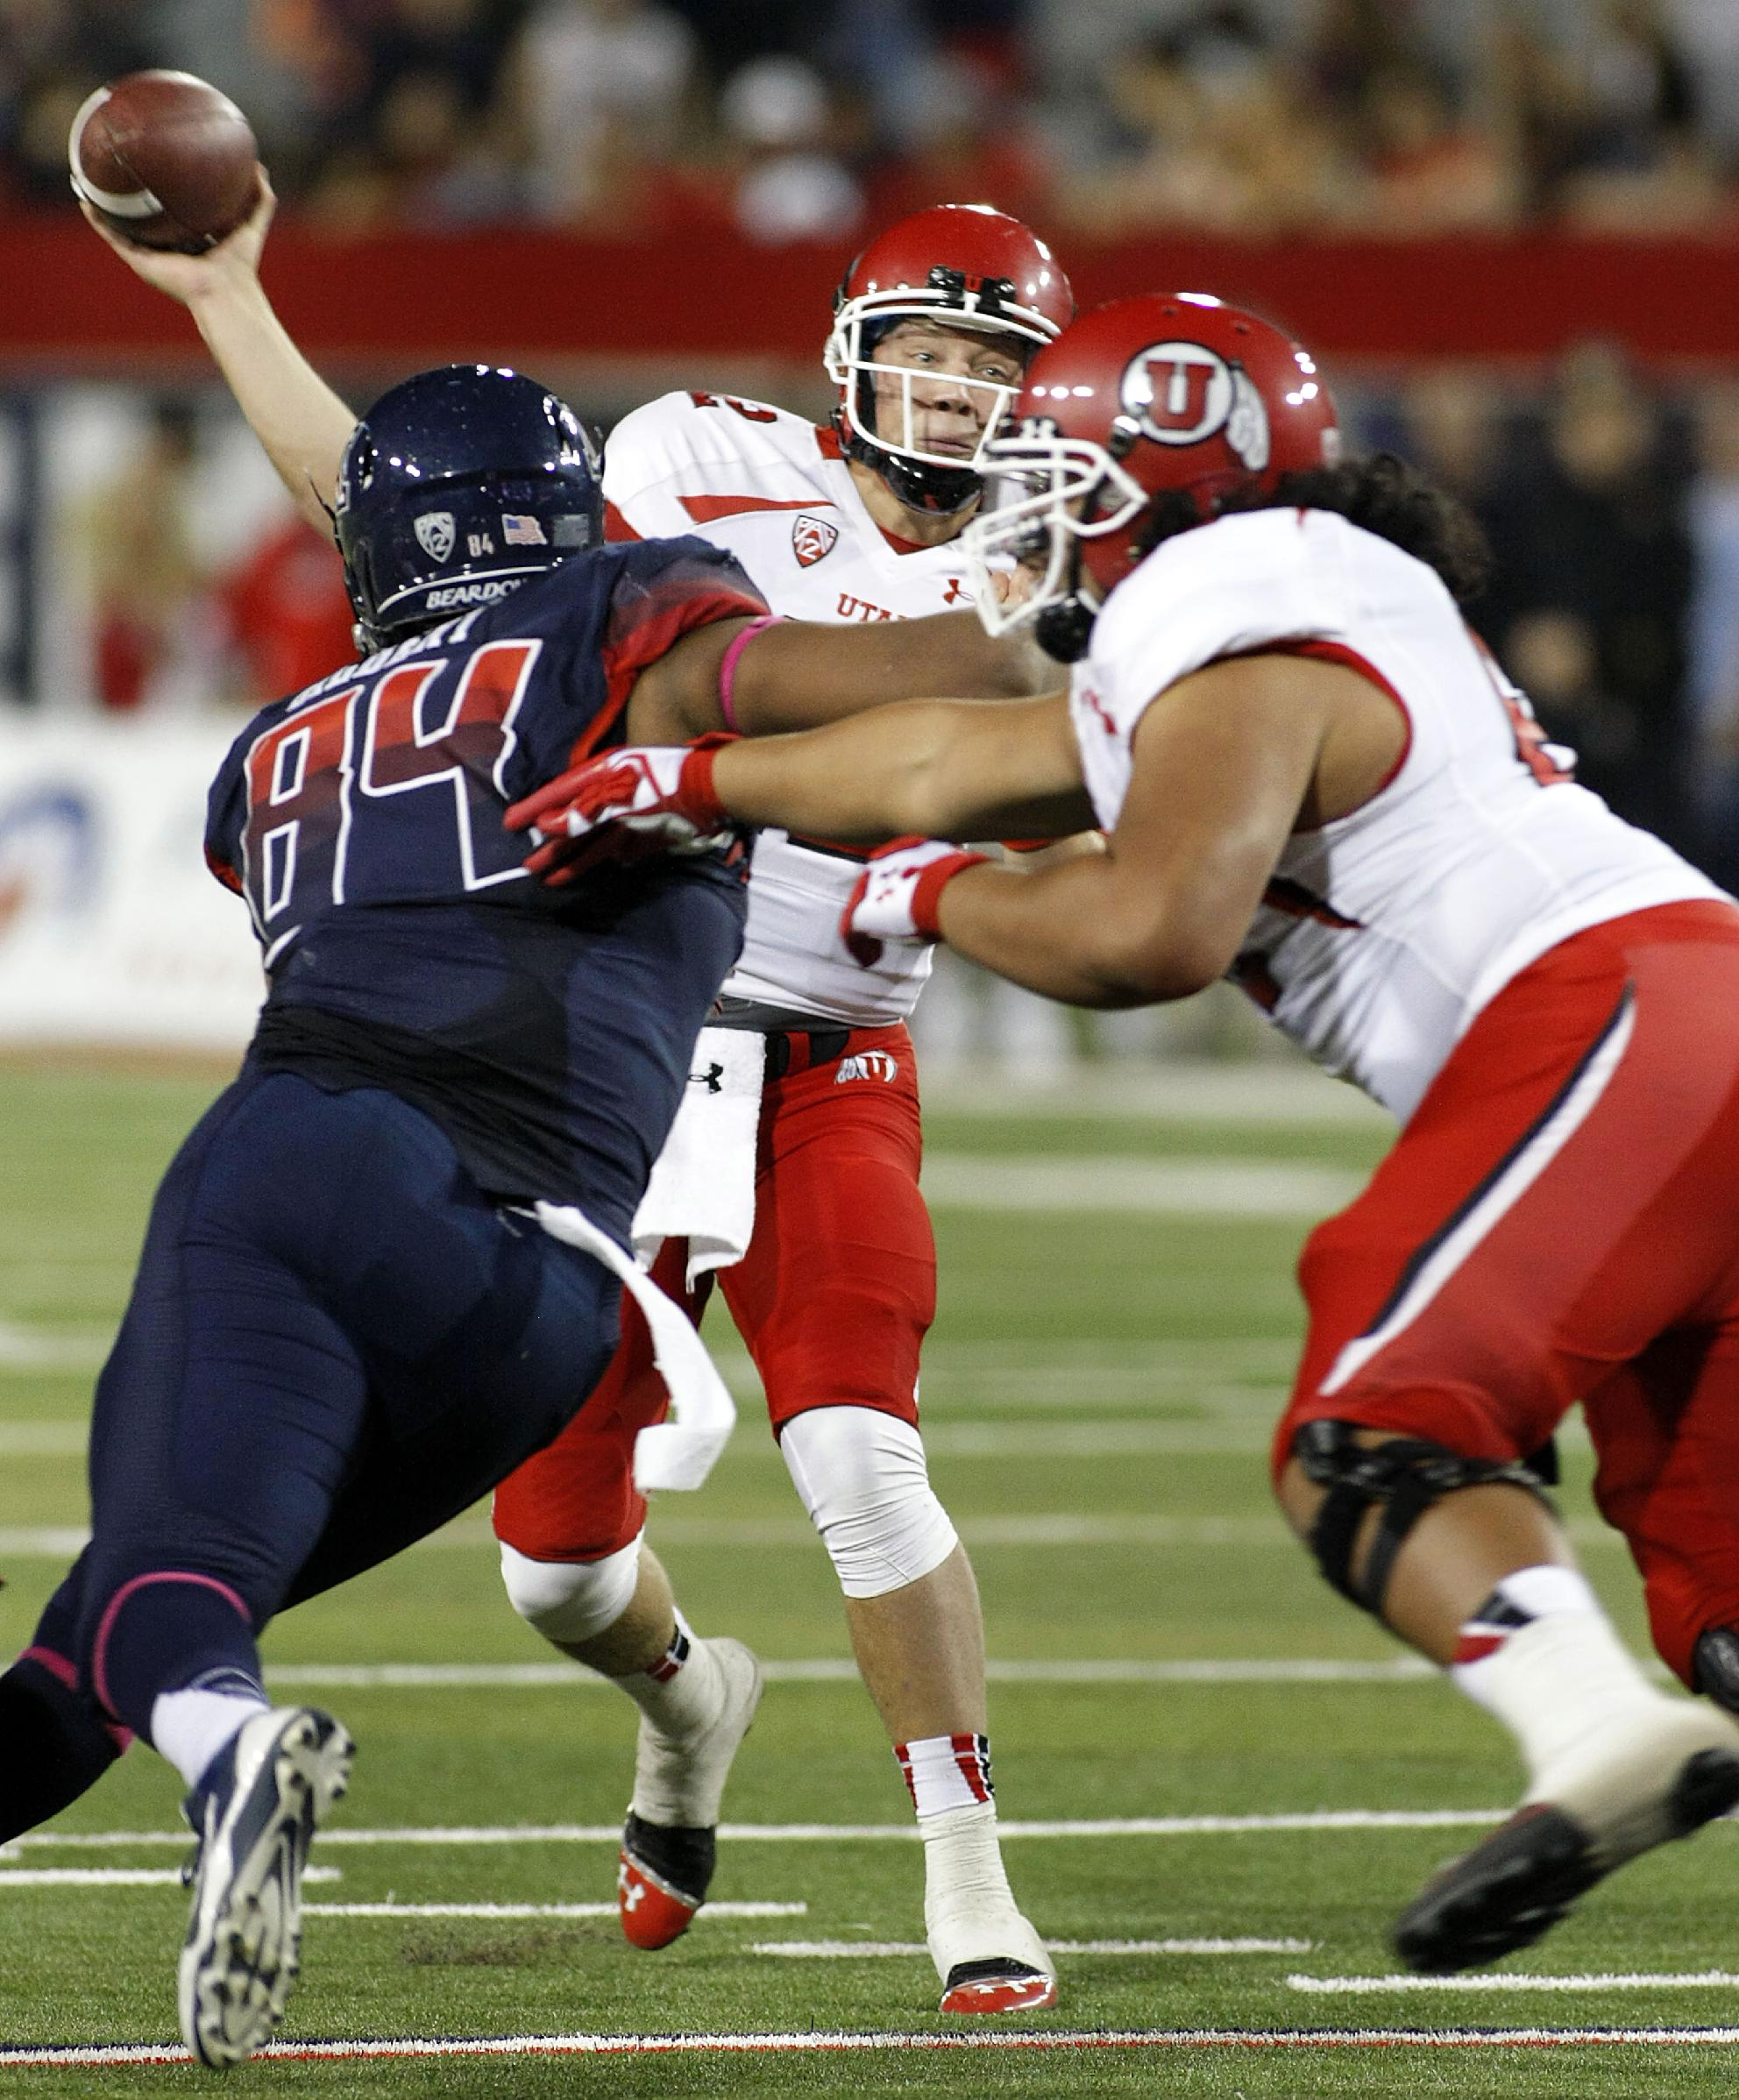 Utah's quarterback Adam Schulz (in back) throws over the Arizona rush in the second half of an NCAA collge football game, Saturday, Oct. 19, 2013 in Tucson, Ariz. Arizona won 35 to 24